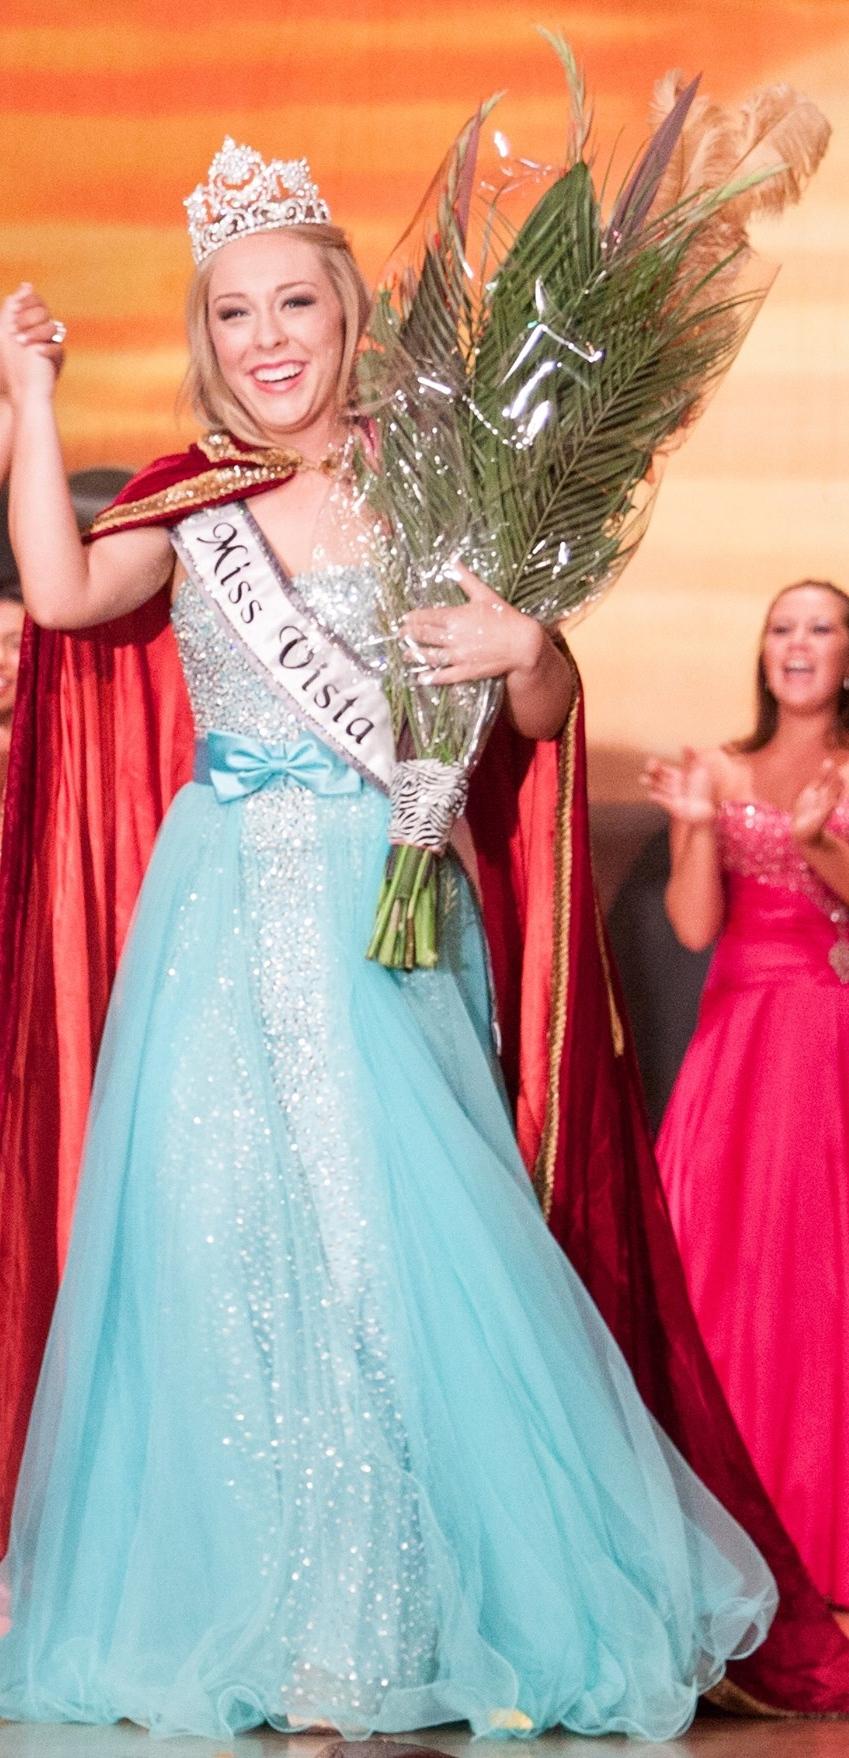 Eileen Jones, Miss Vista 2014